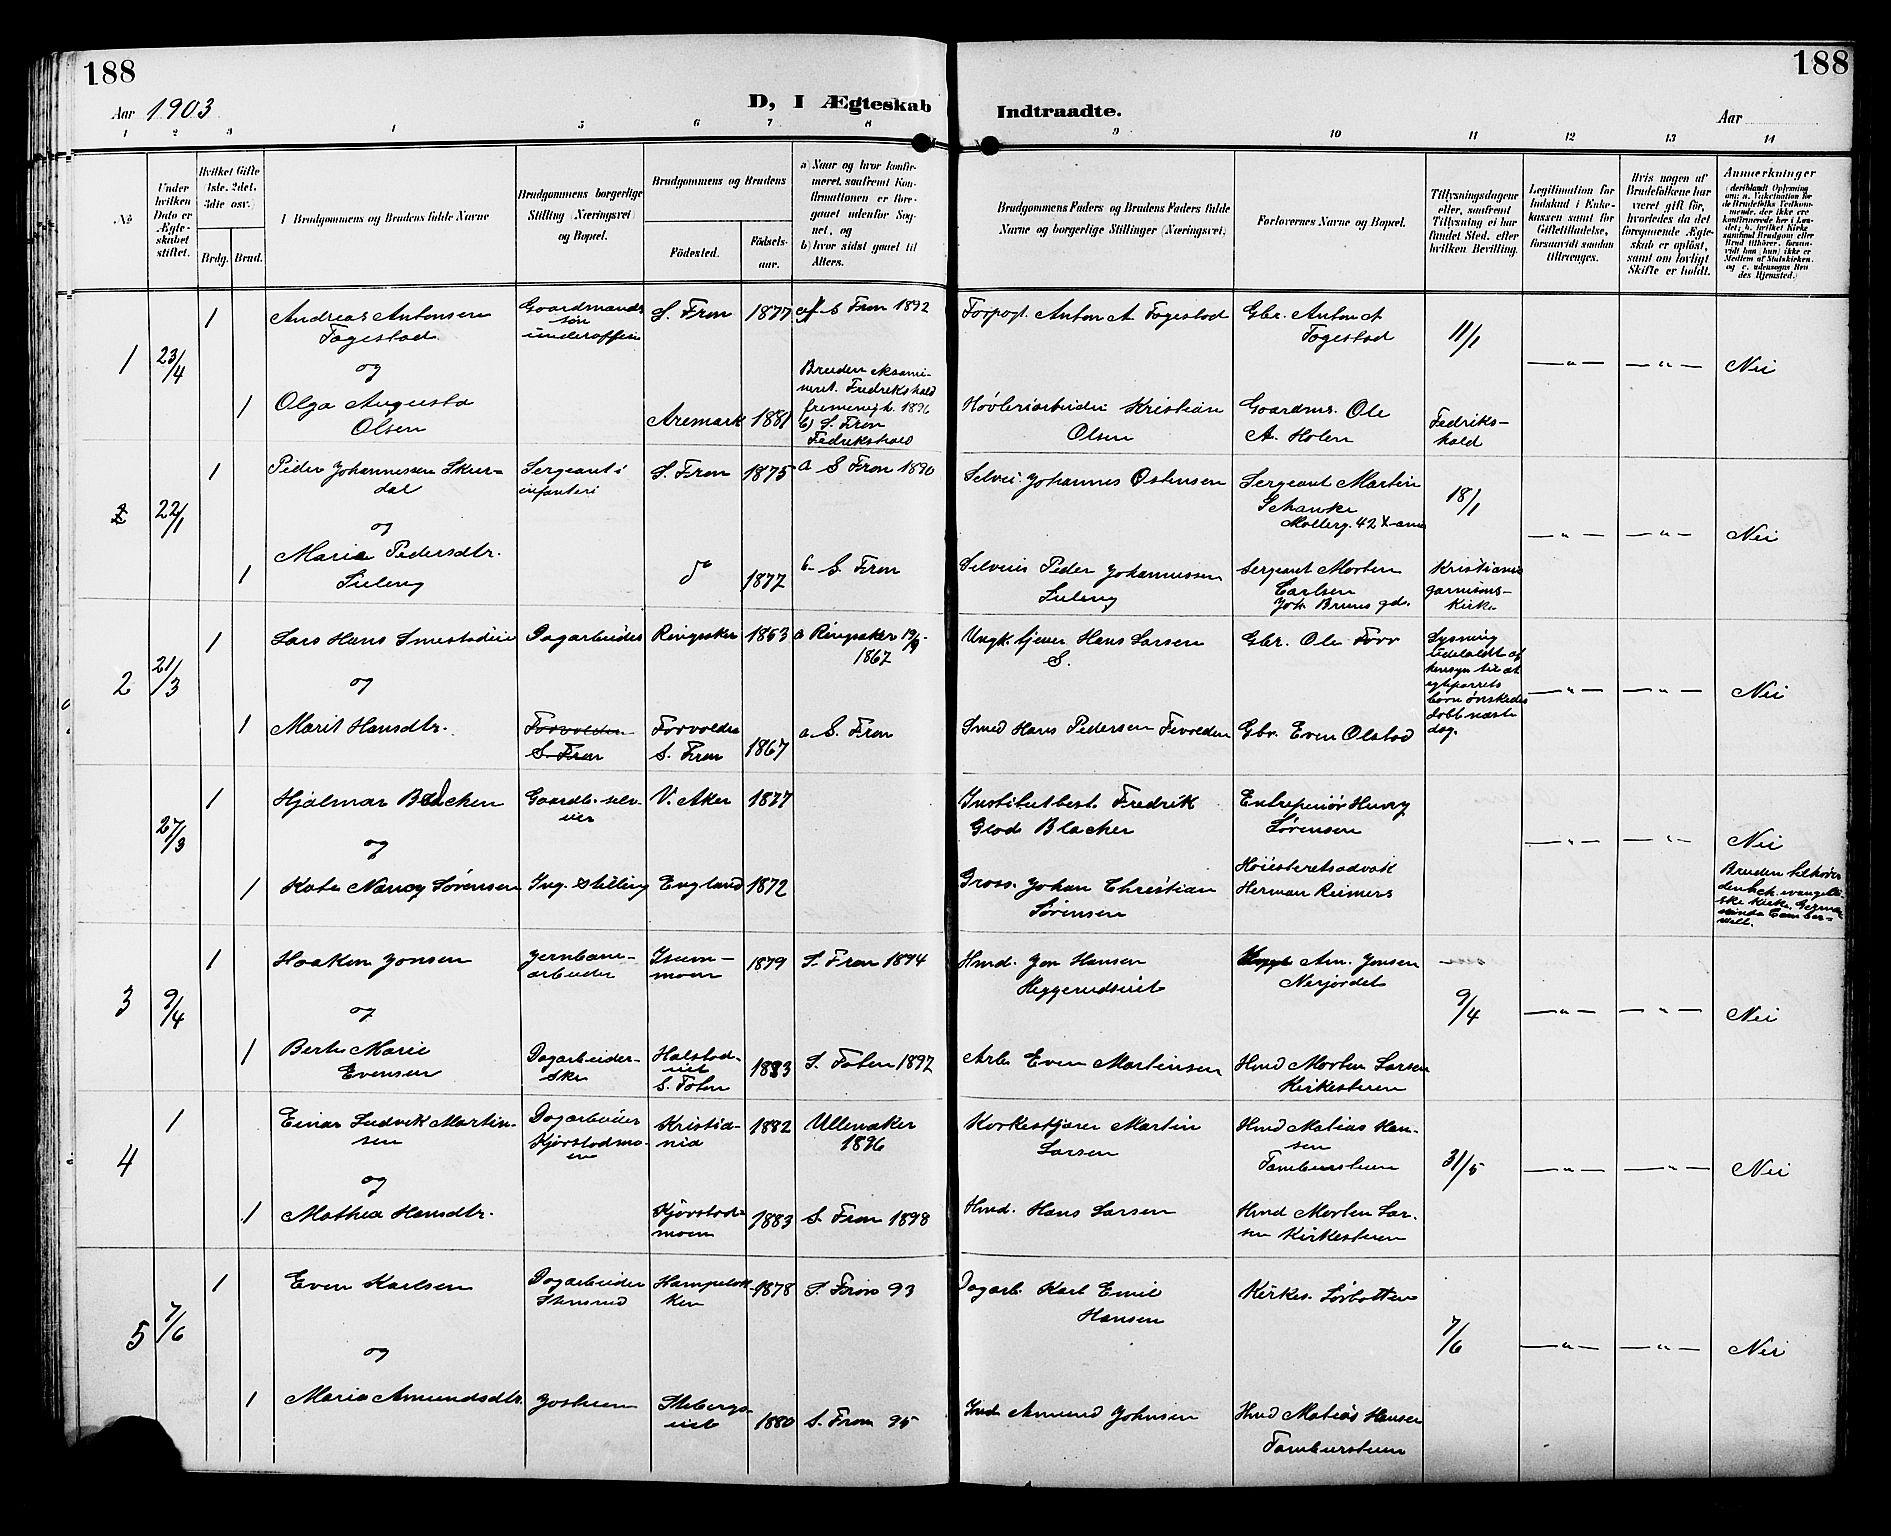 SAH, Sør-Fron prestekontor, H/Ha/Hab/L0004: Klokkerbok nr. 4, 1896-1911, s. 188